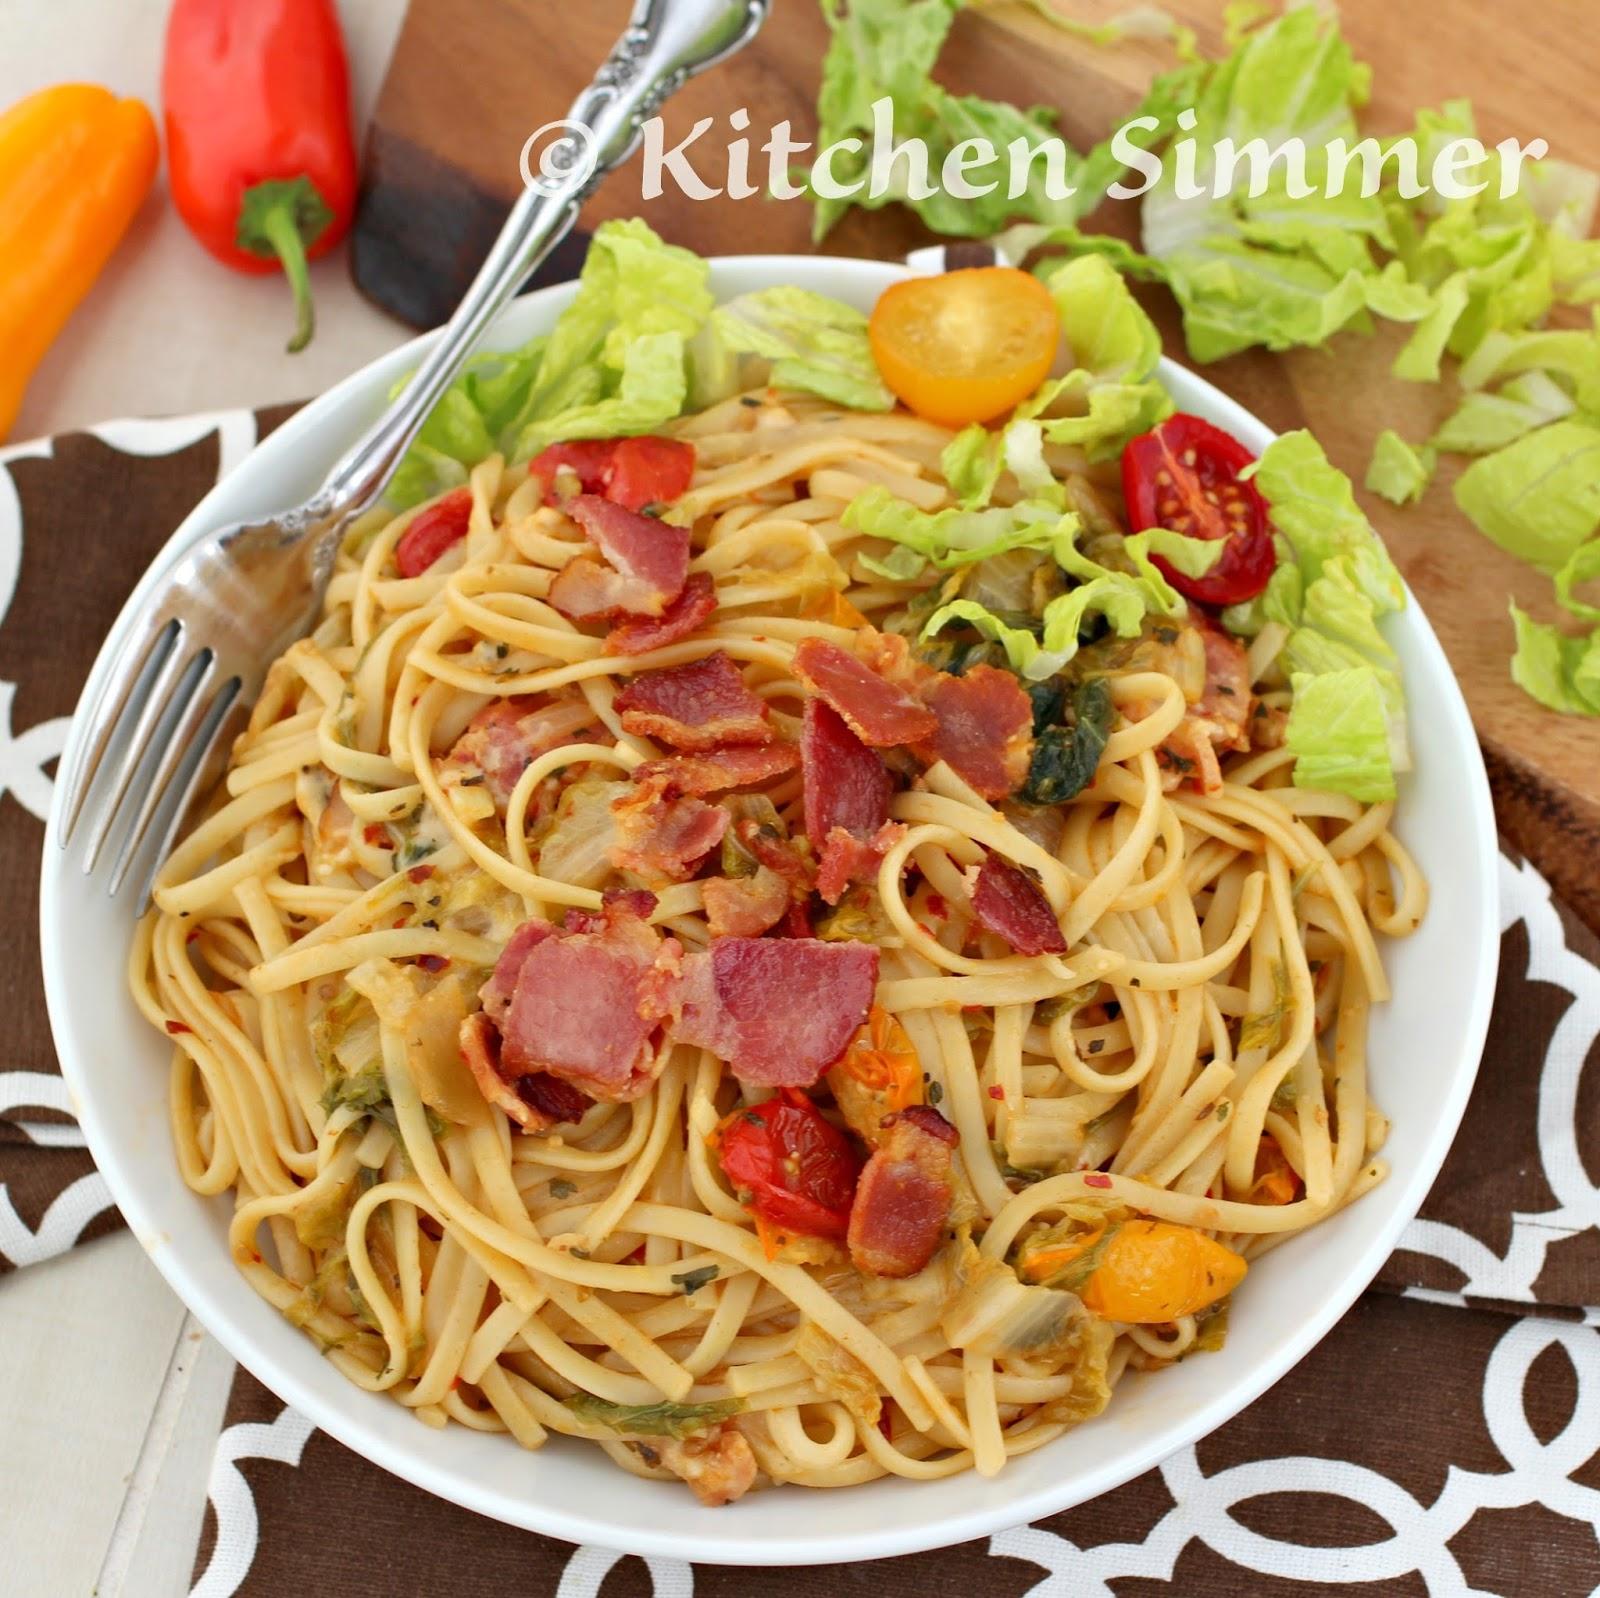 Kitchen Simmer: BLT Pasta (Bacon Lettuce and Tomato Pasta)